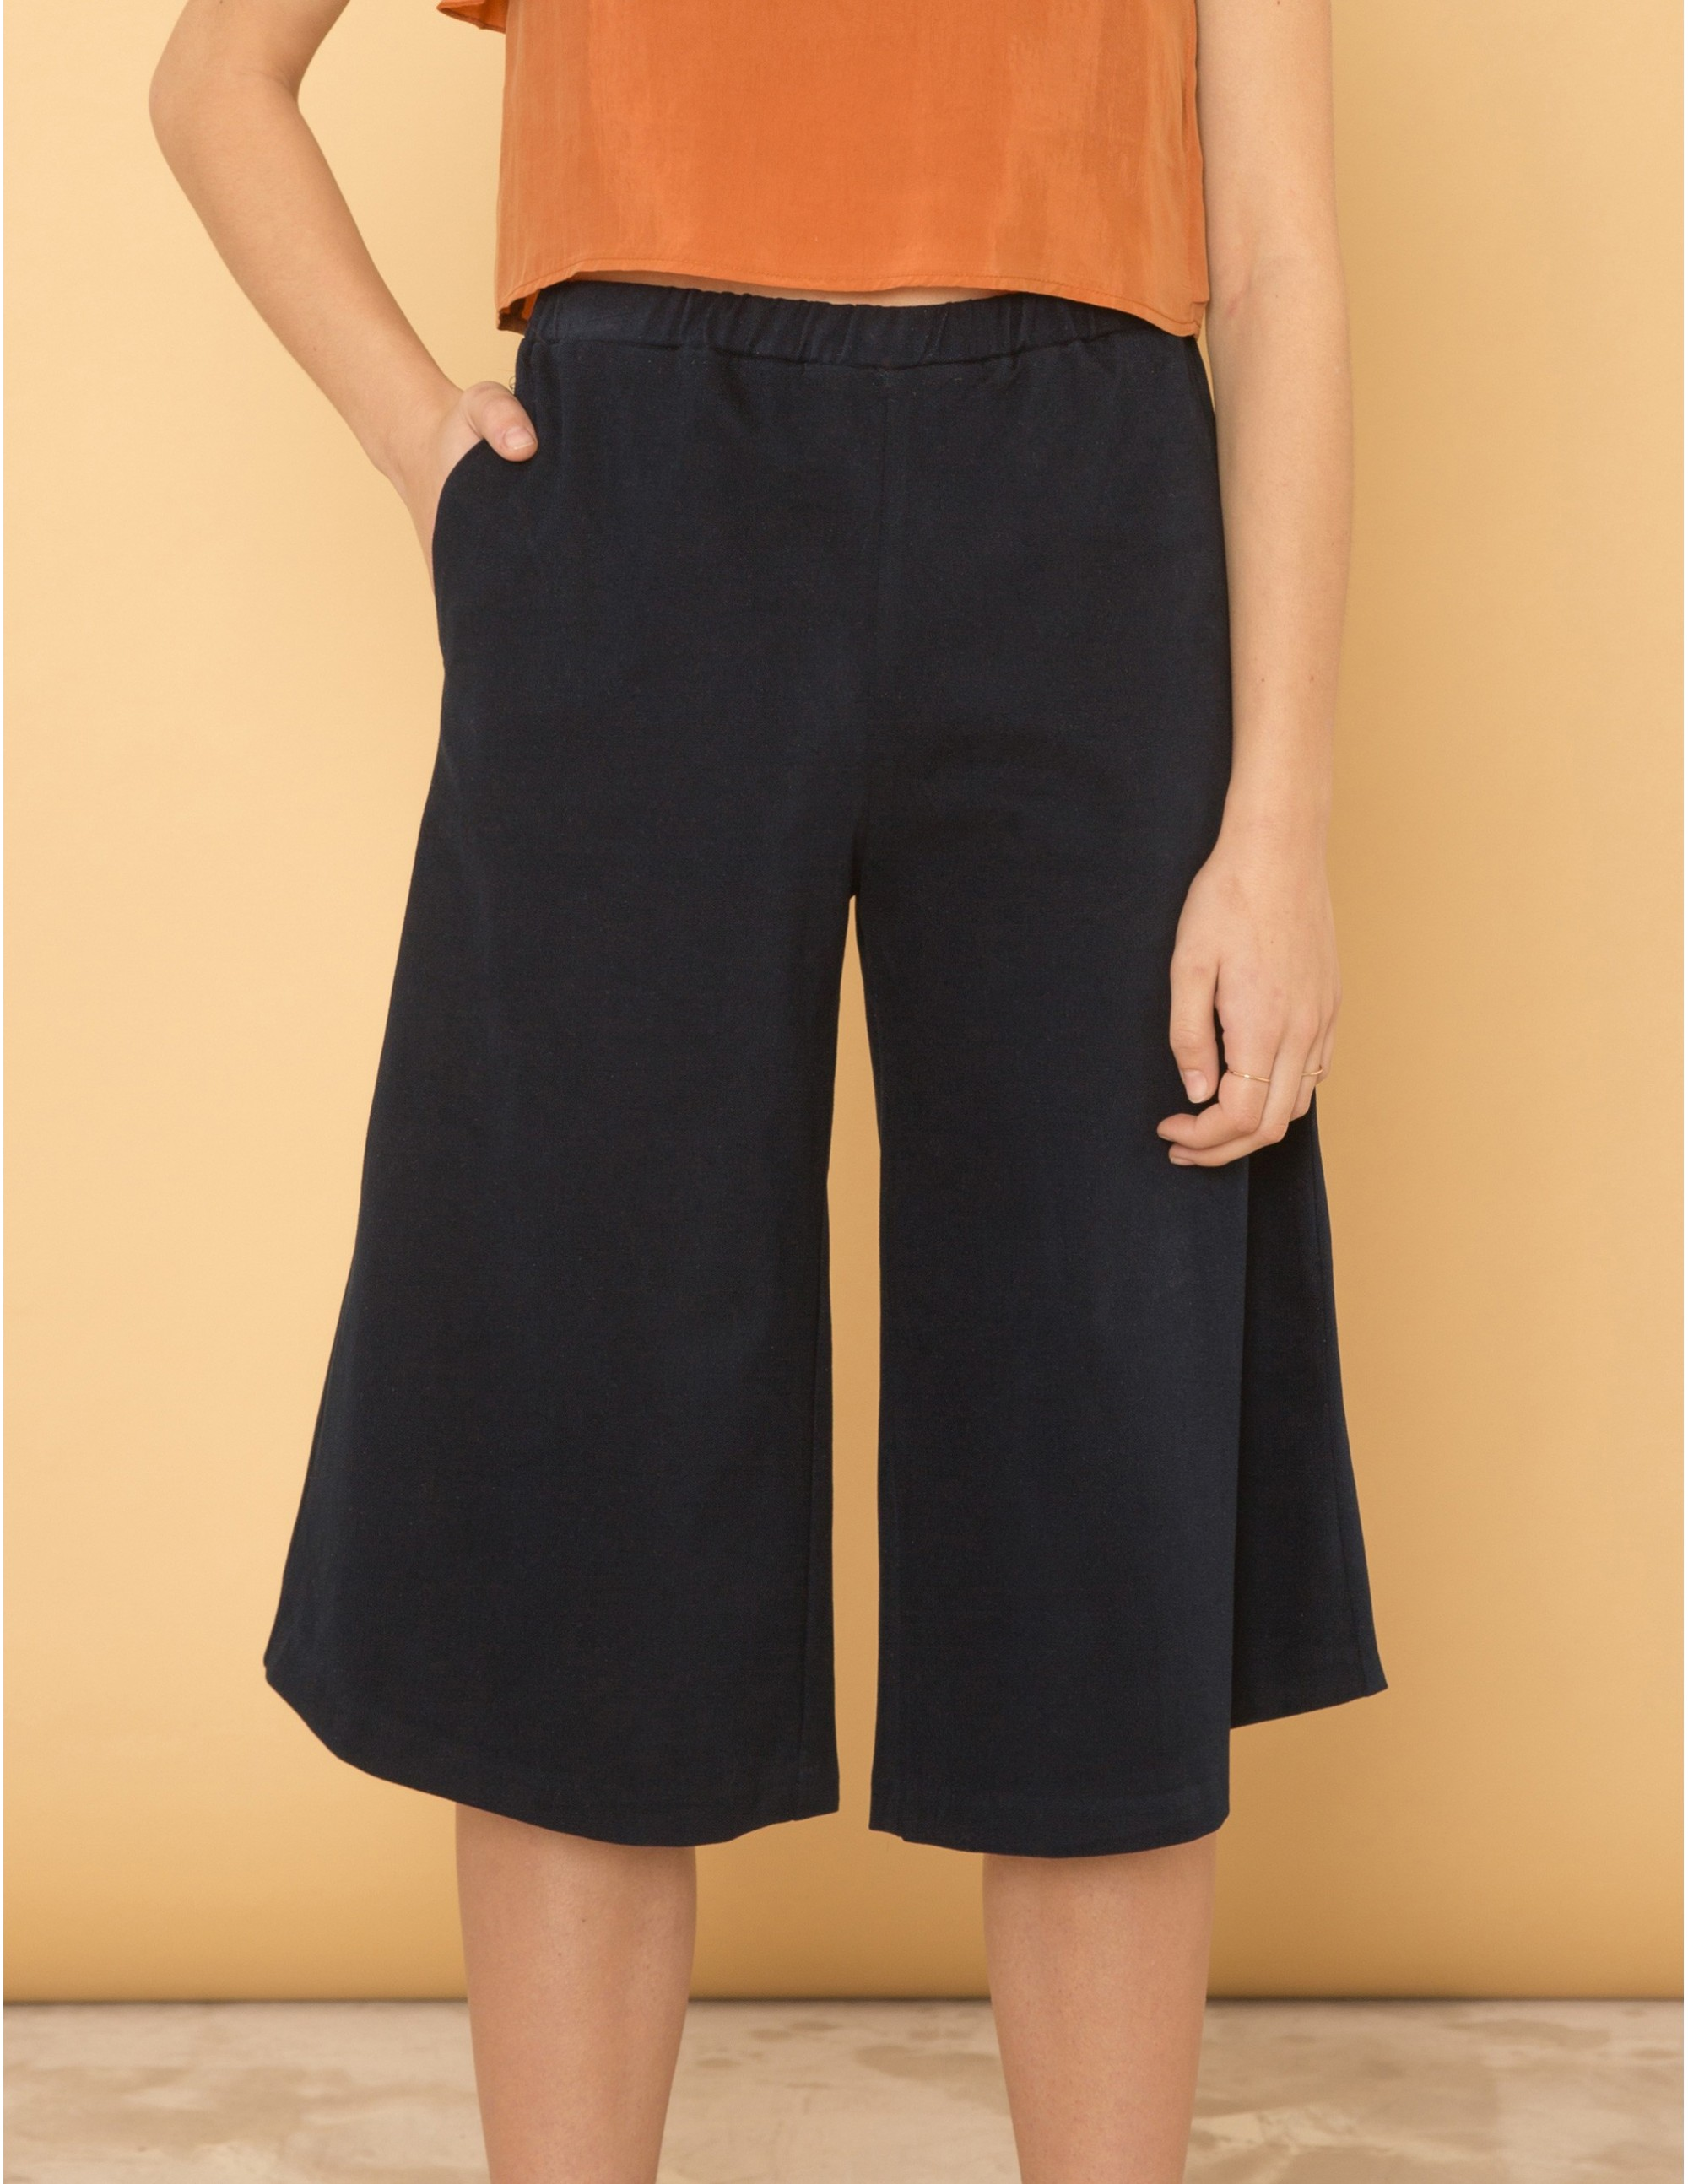 DISTRACTION pantalones - BLU NOTTE